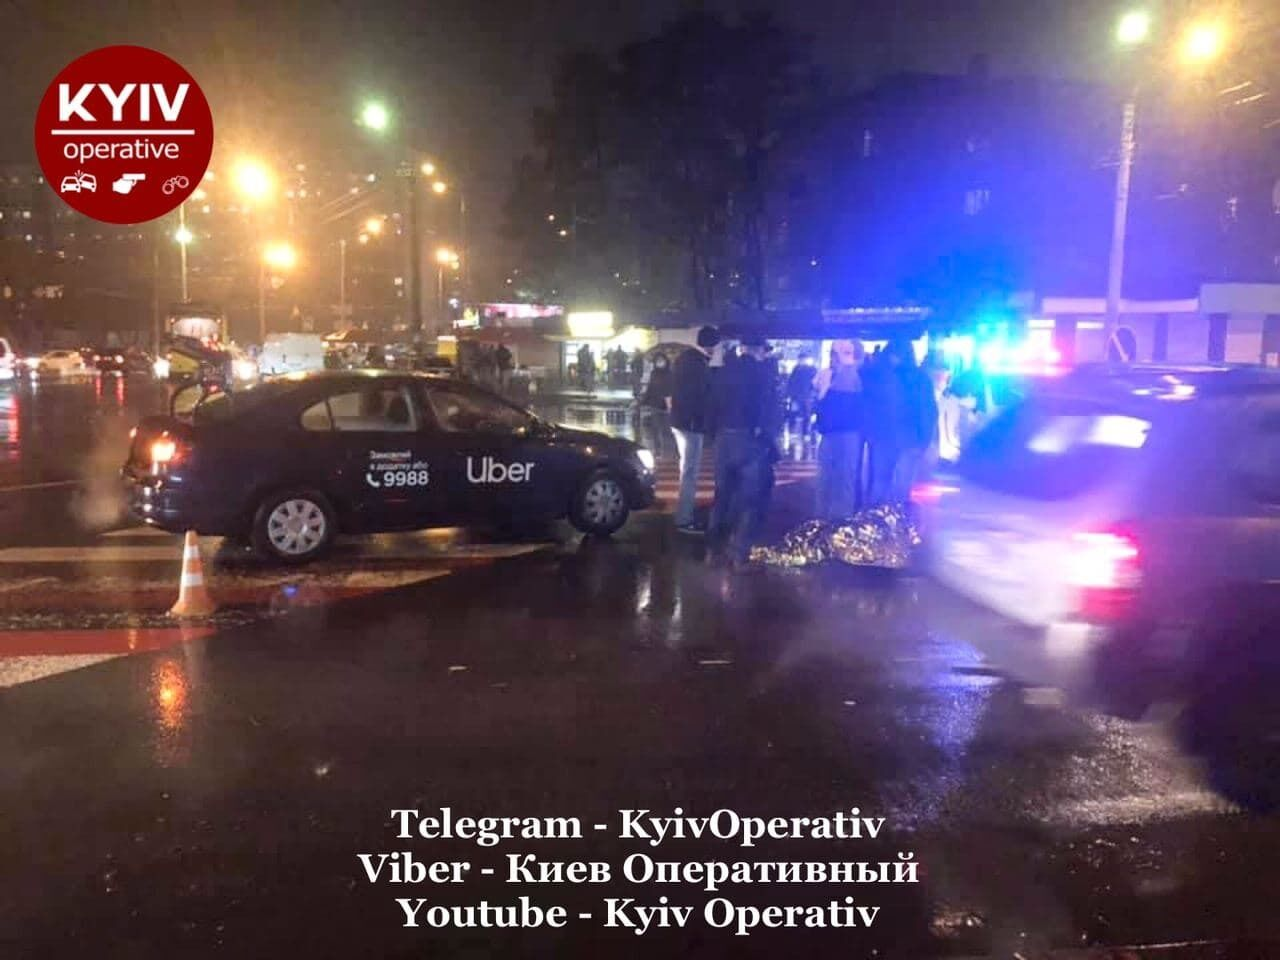 Такси сбило девушку на площади Шевченко в Киеве.